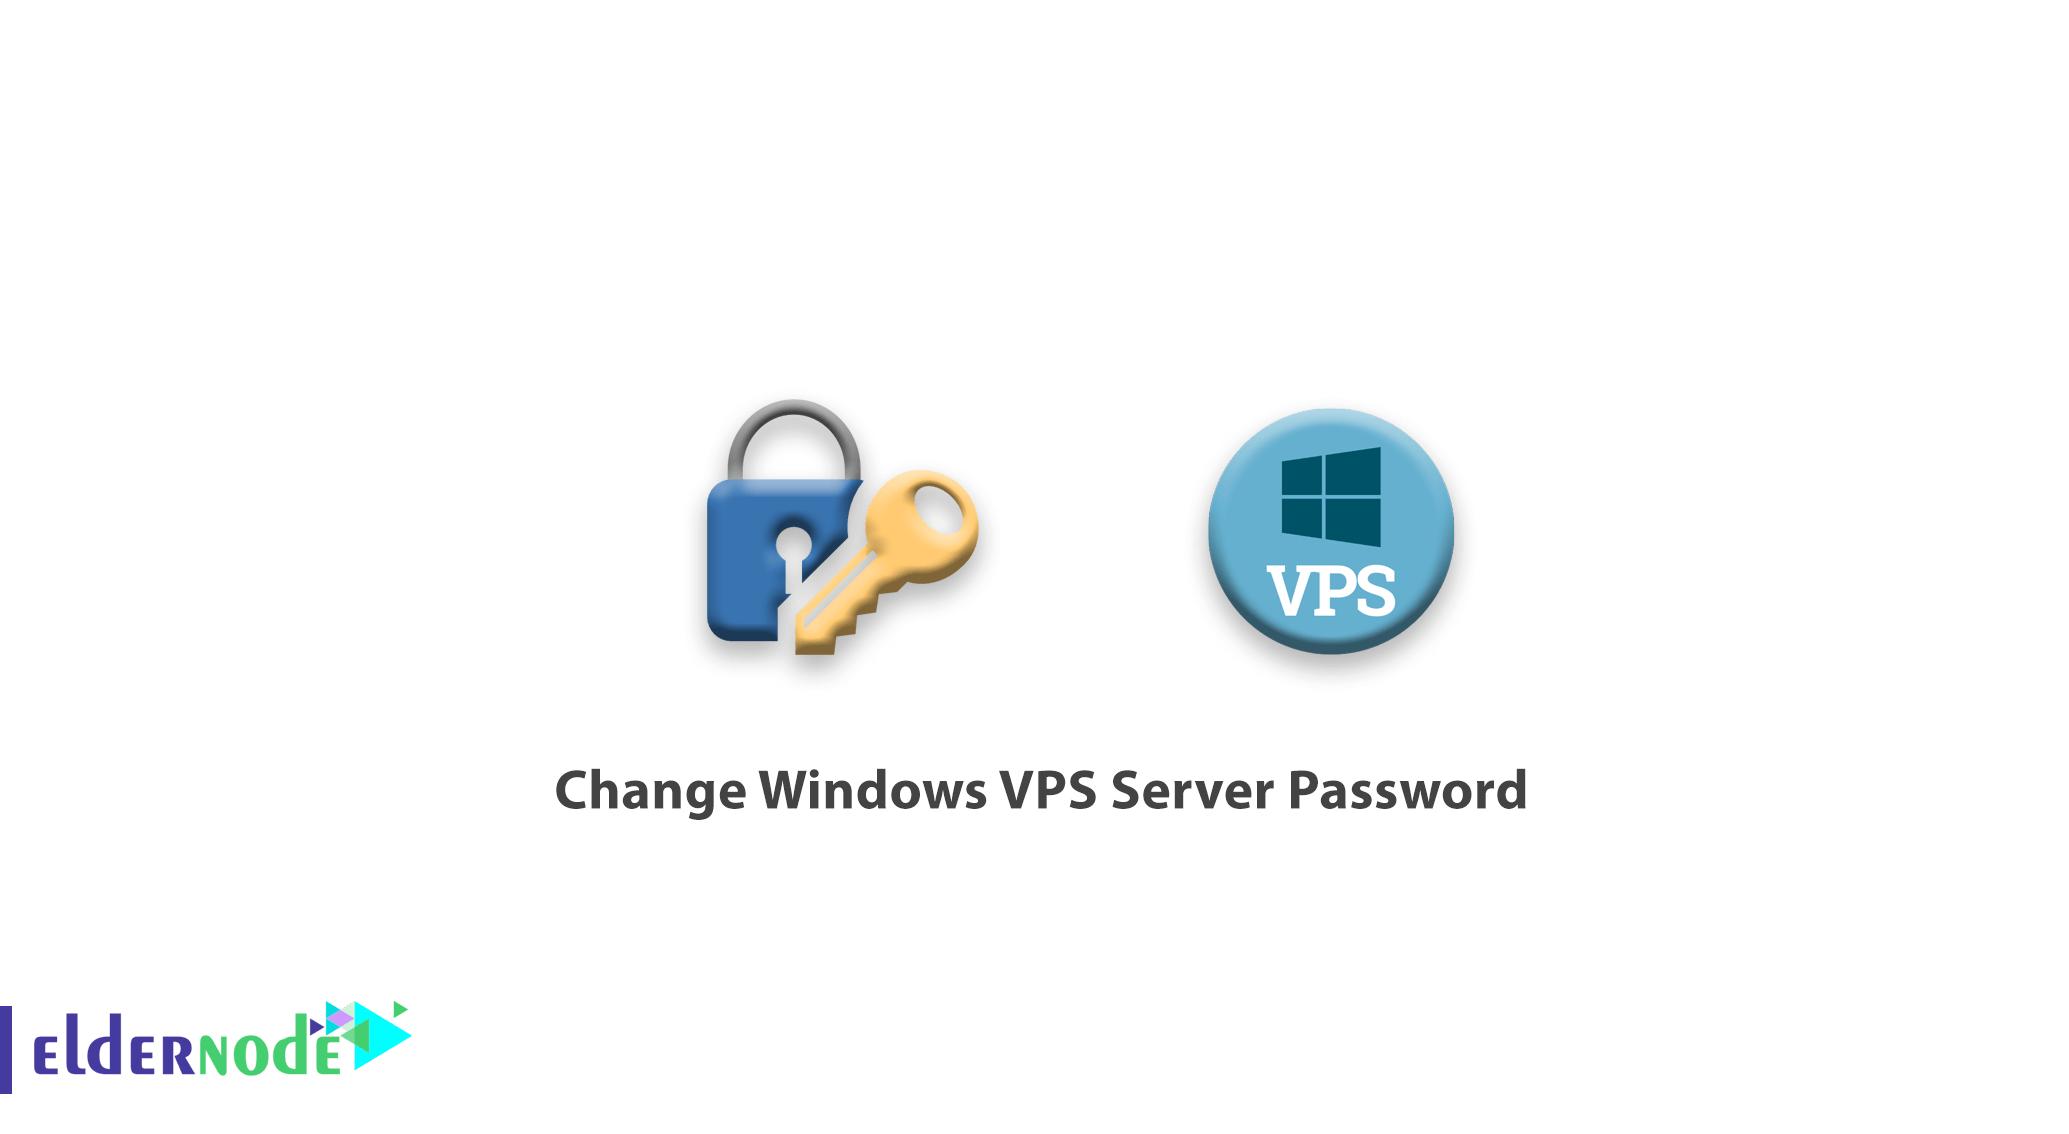 Change Windows VPS Server Password